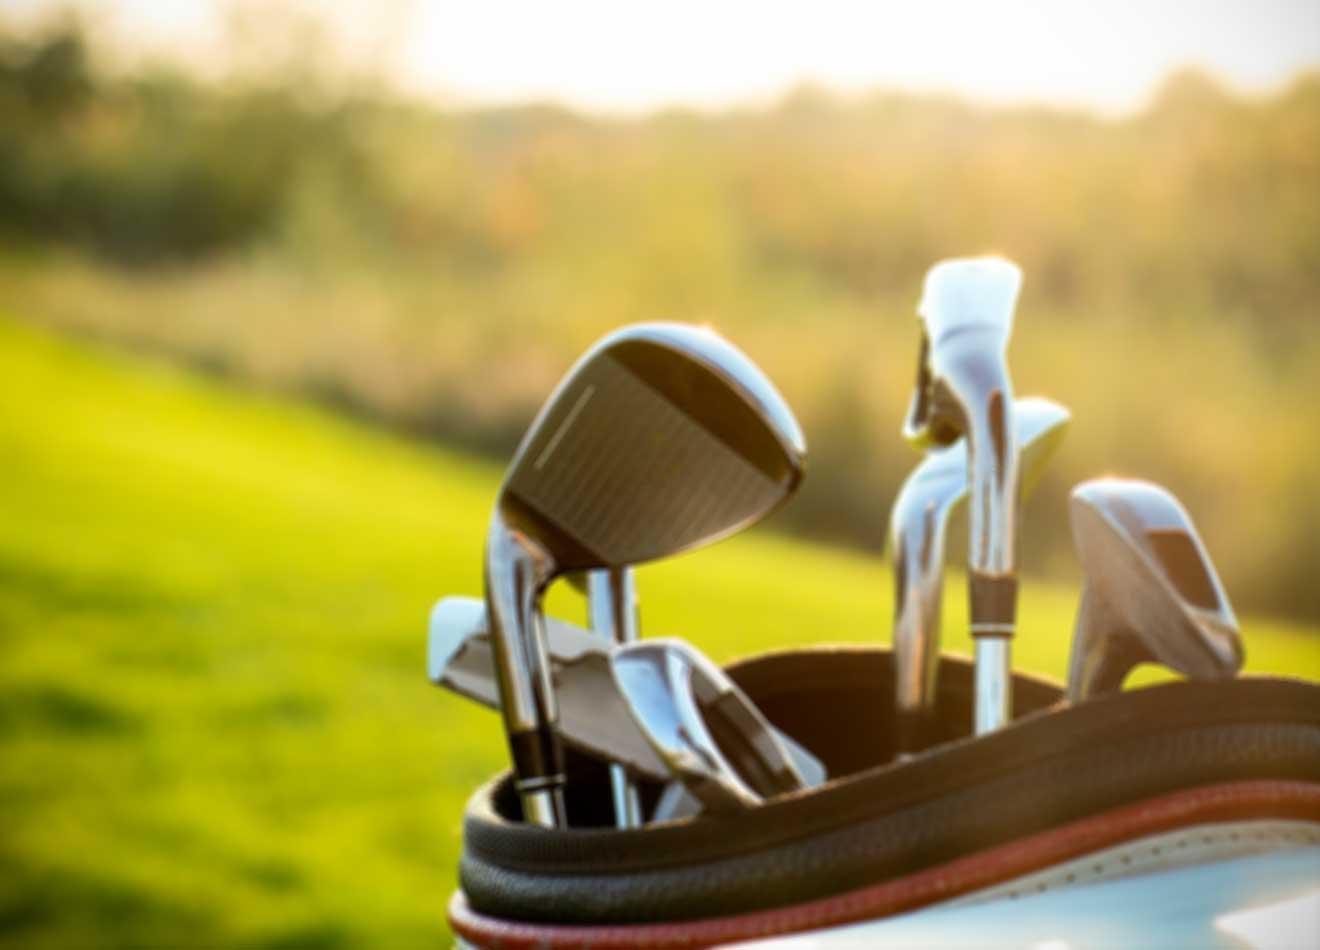 2019 President's Scholars Golf Tournament Registration